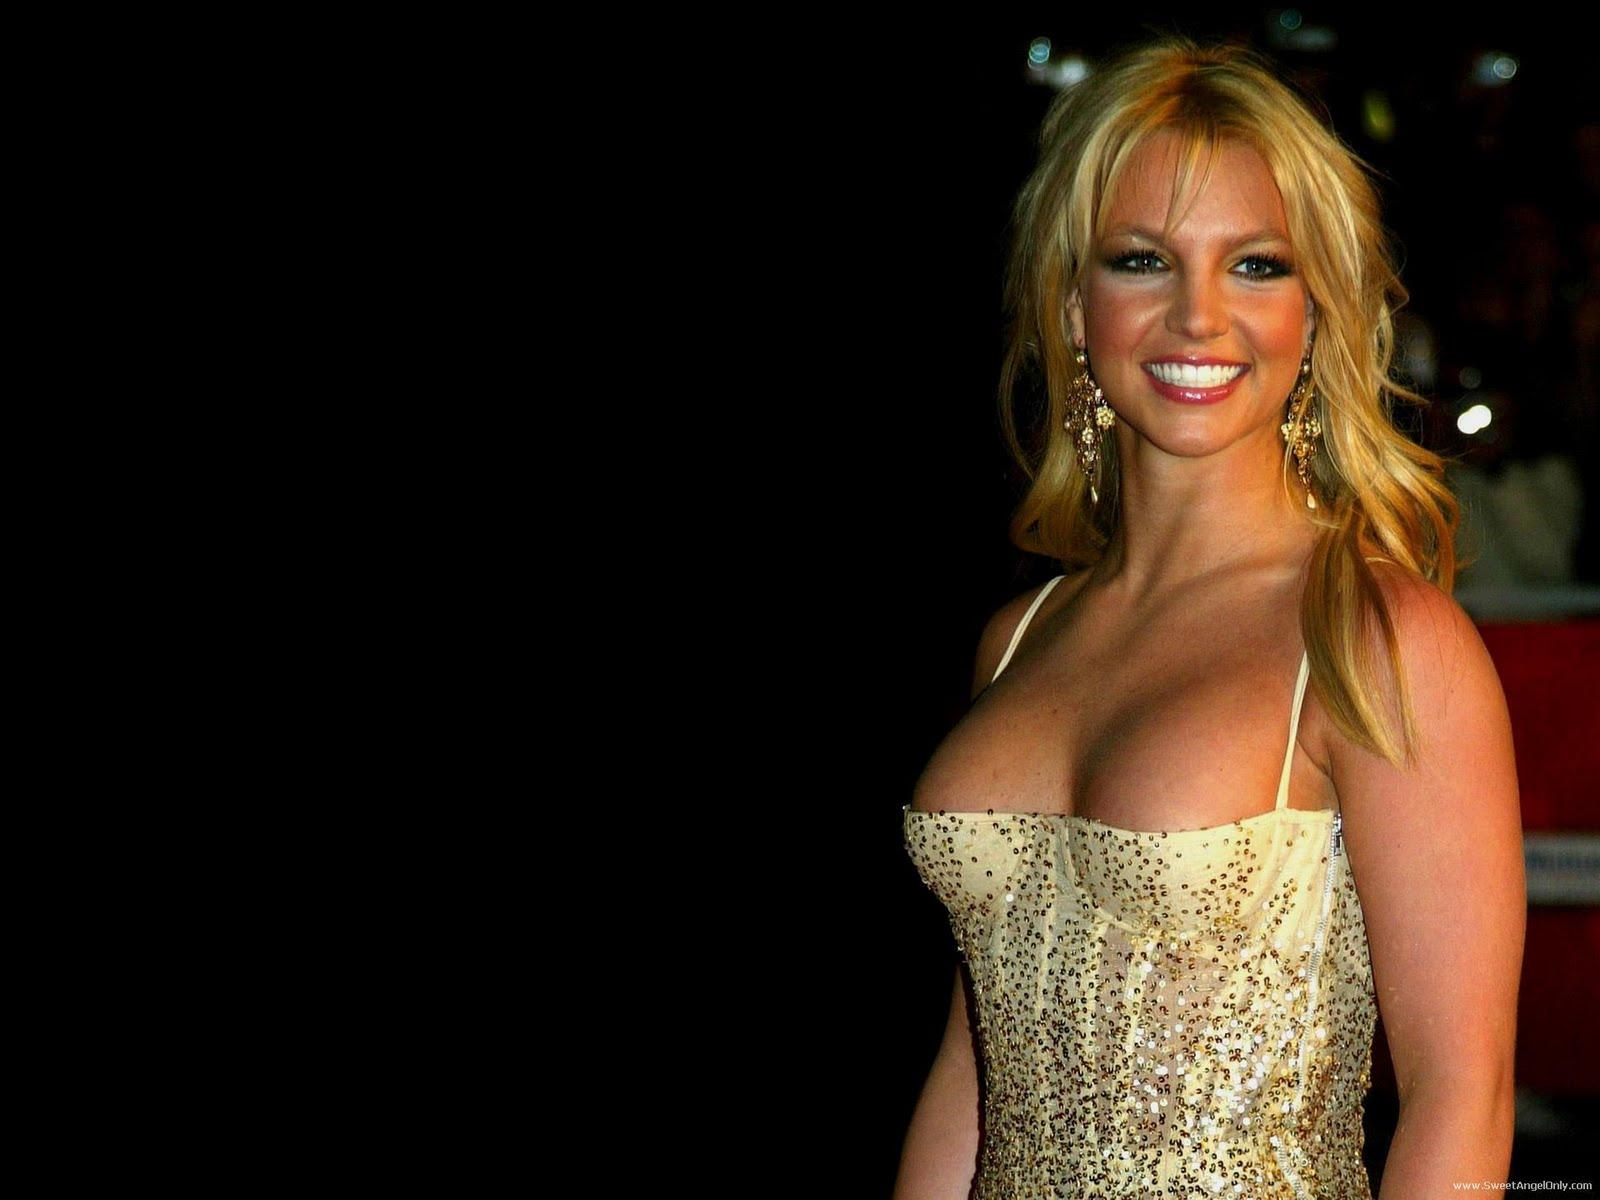 http://3.bp.blogspot.com/-IWw3qu45gAc/TtiTI8KhPyI/AAAAAAAABSc/1QFJf3tkEdg/s1600/hollywood_singer_britney_spears_wallpaper-1600x1200-08.jpg